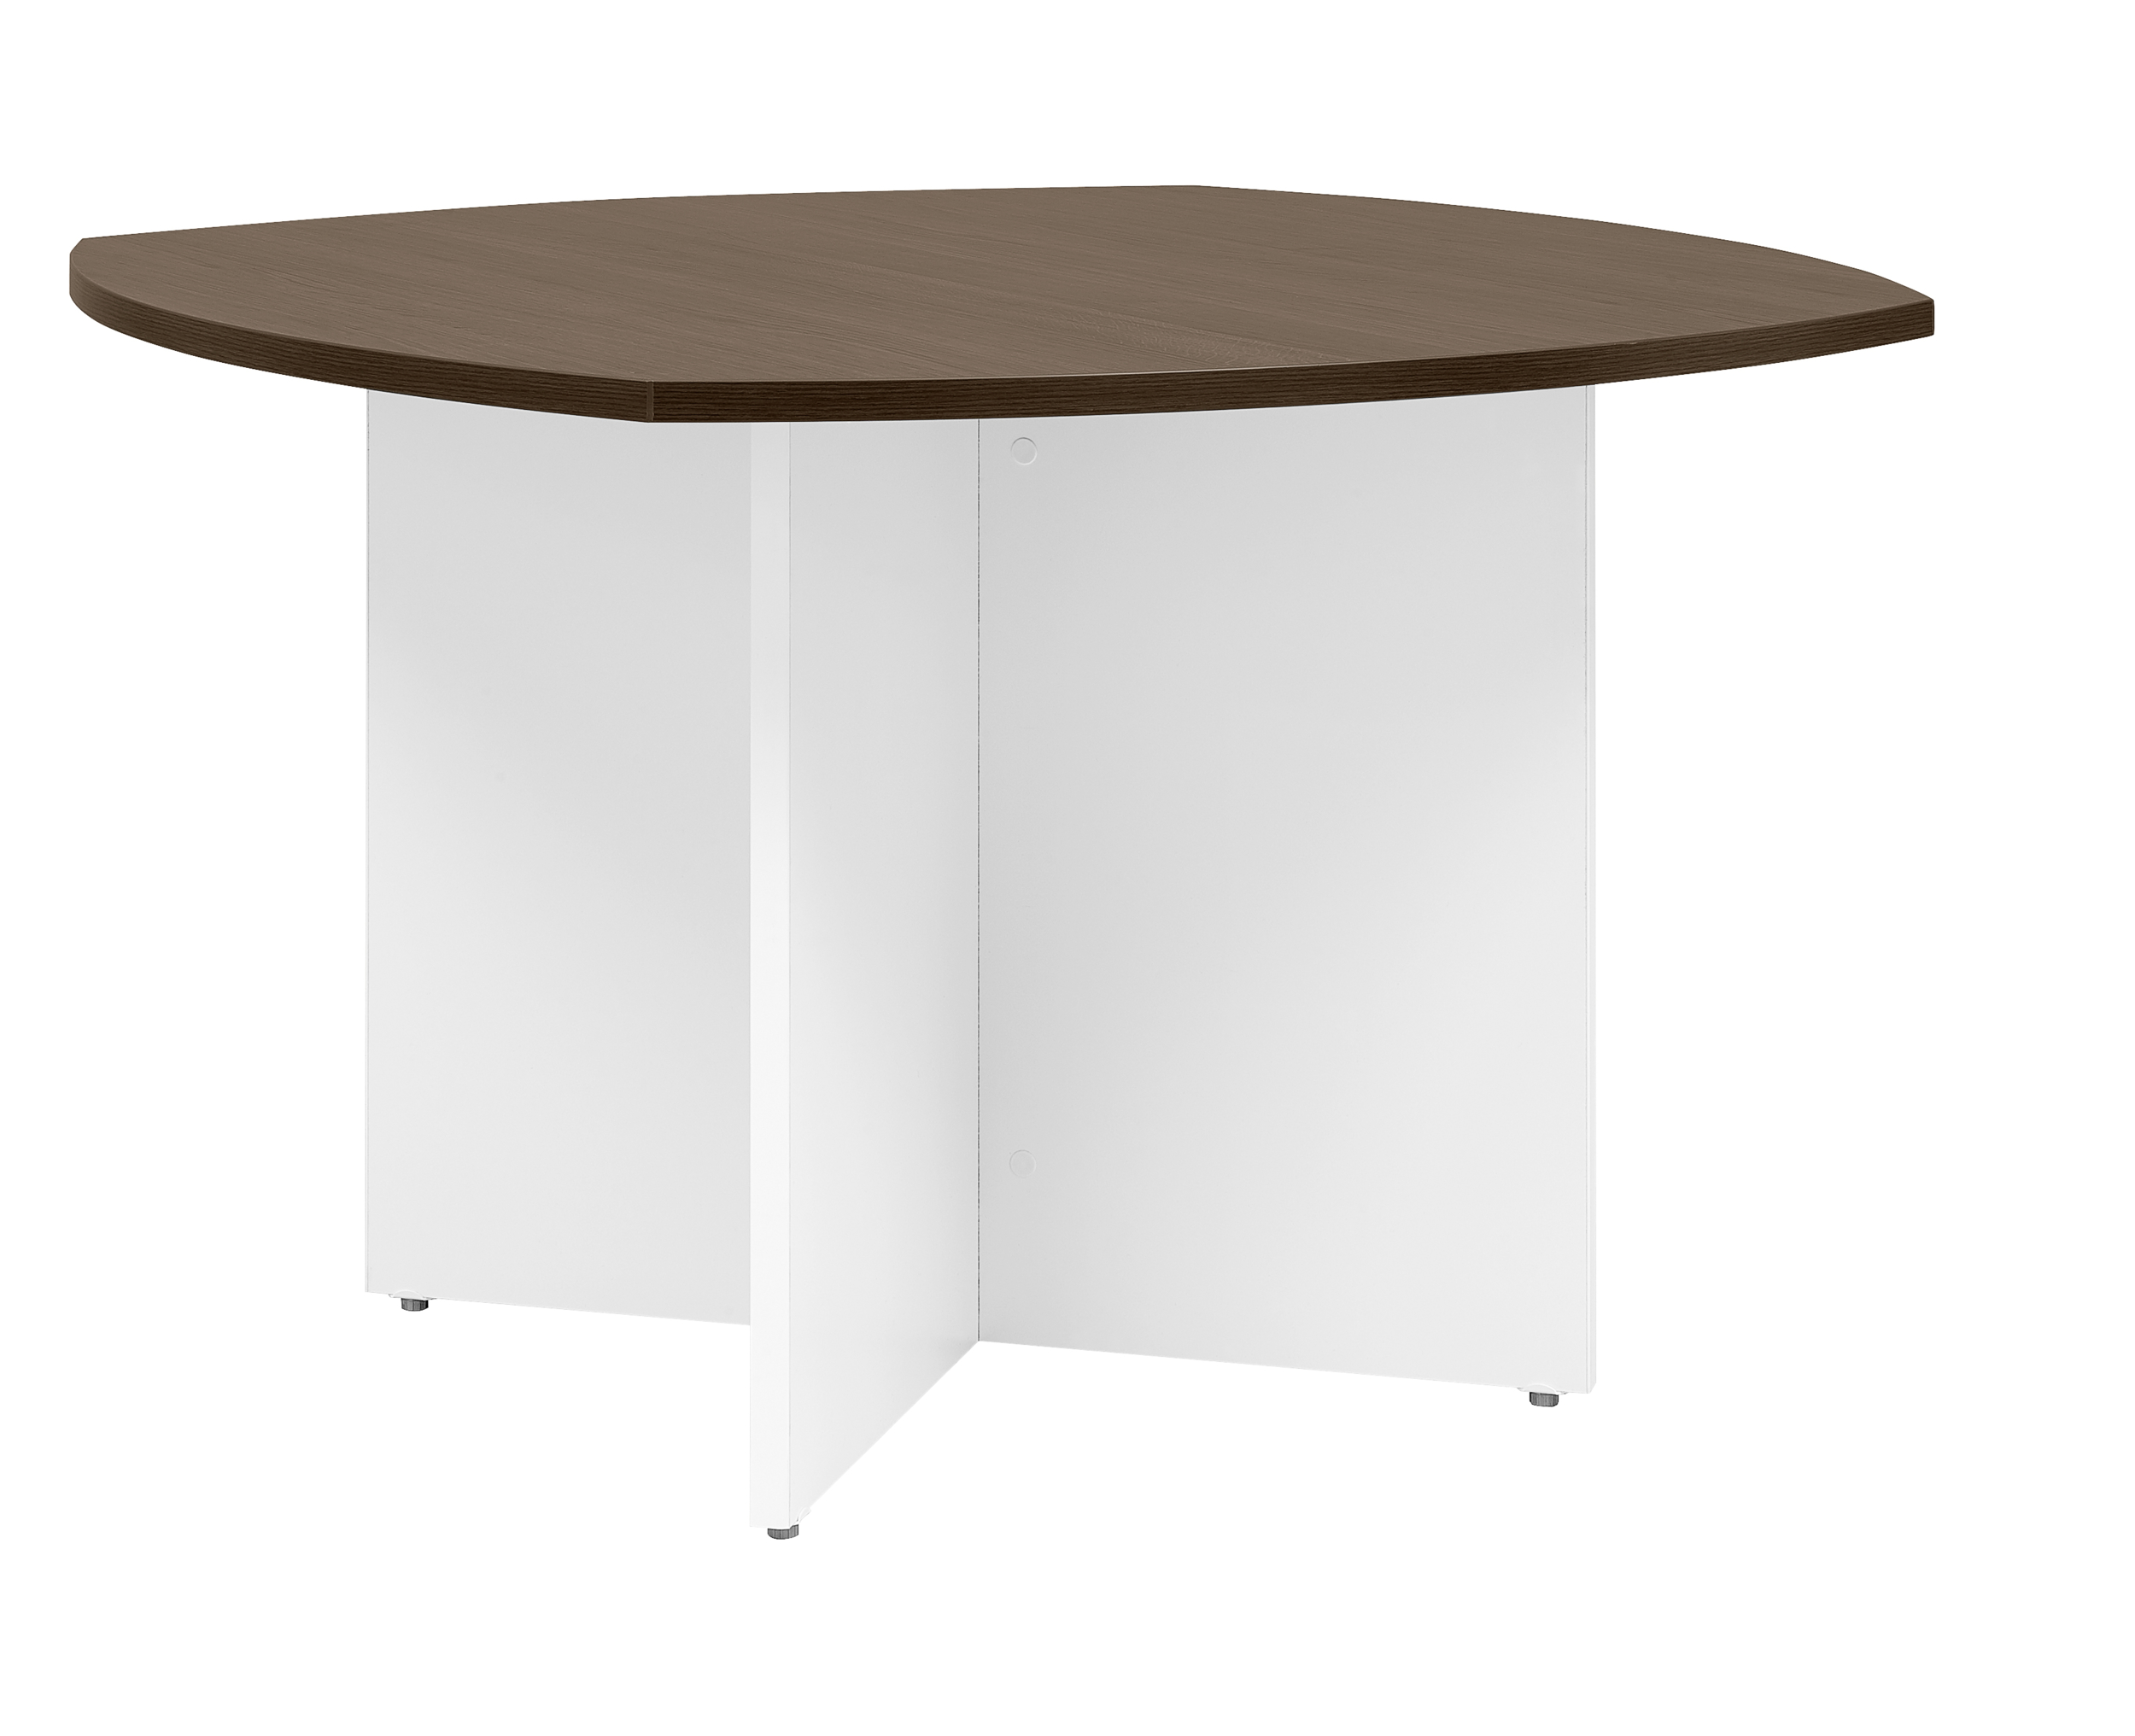 YES/XERUS CHÊNE ROYAL TABLE RONDE